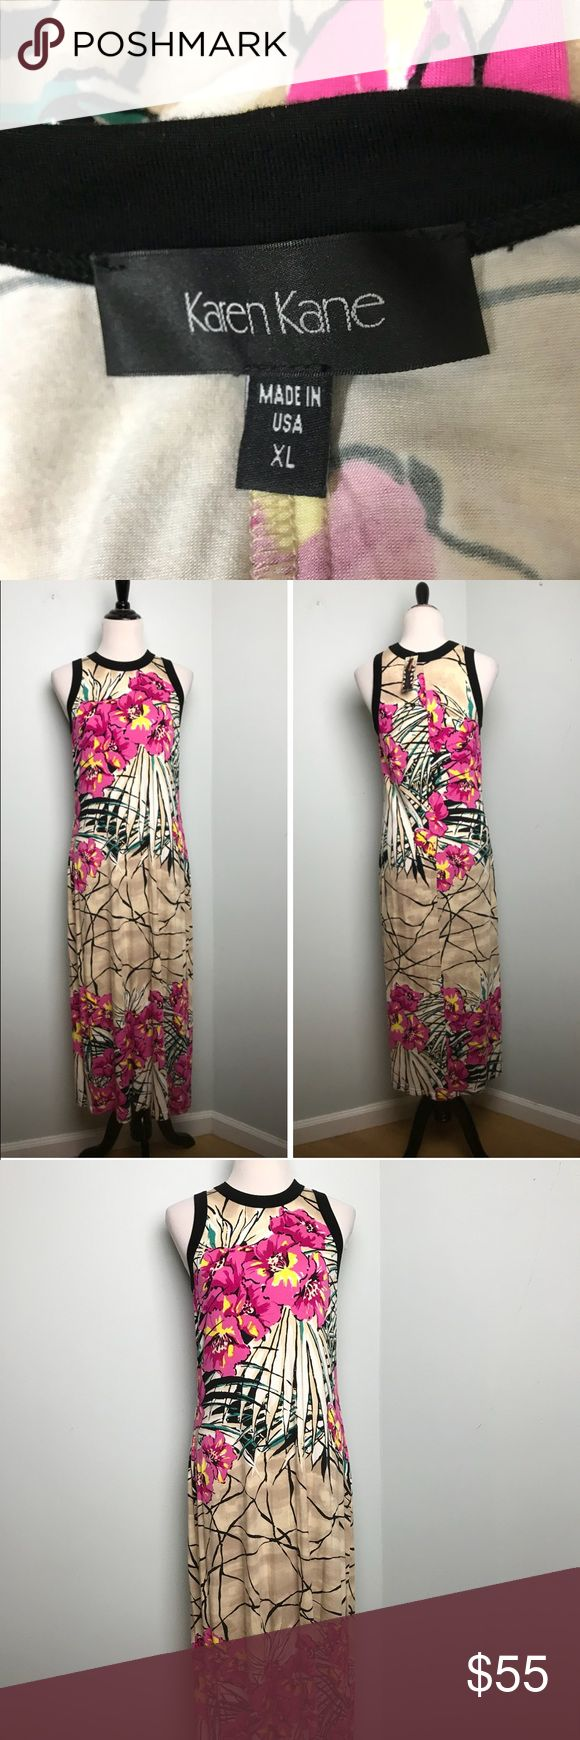 Karen Kane Maxi Dress. Size XL New Karen Kane Maxi Dress. Summerland Halter Maxi. Sleeveless. Very soft stretchy fabric. Size XL NWT Karen Kane Dresses Maxi